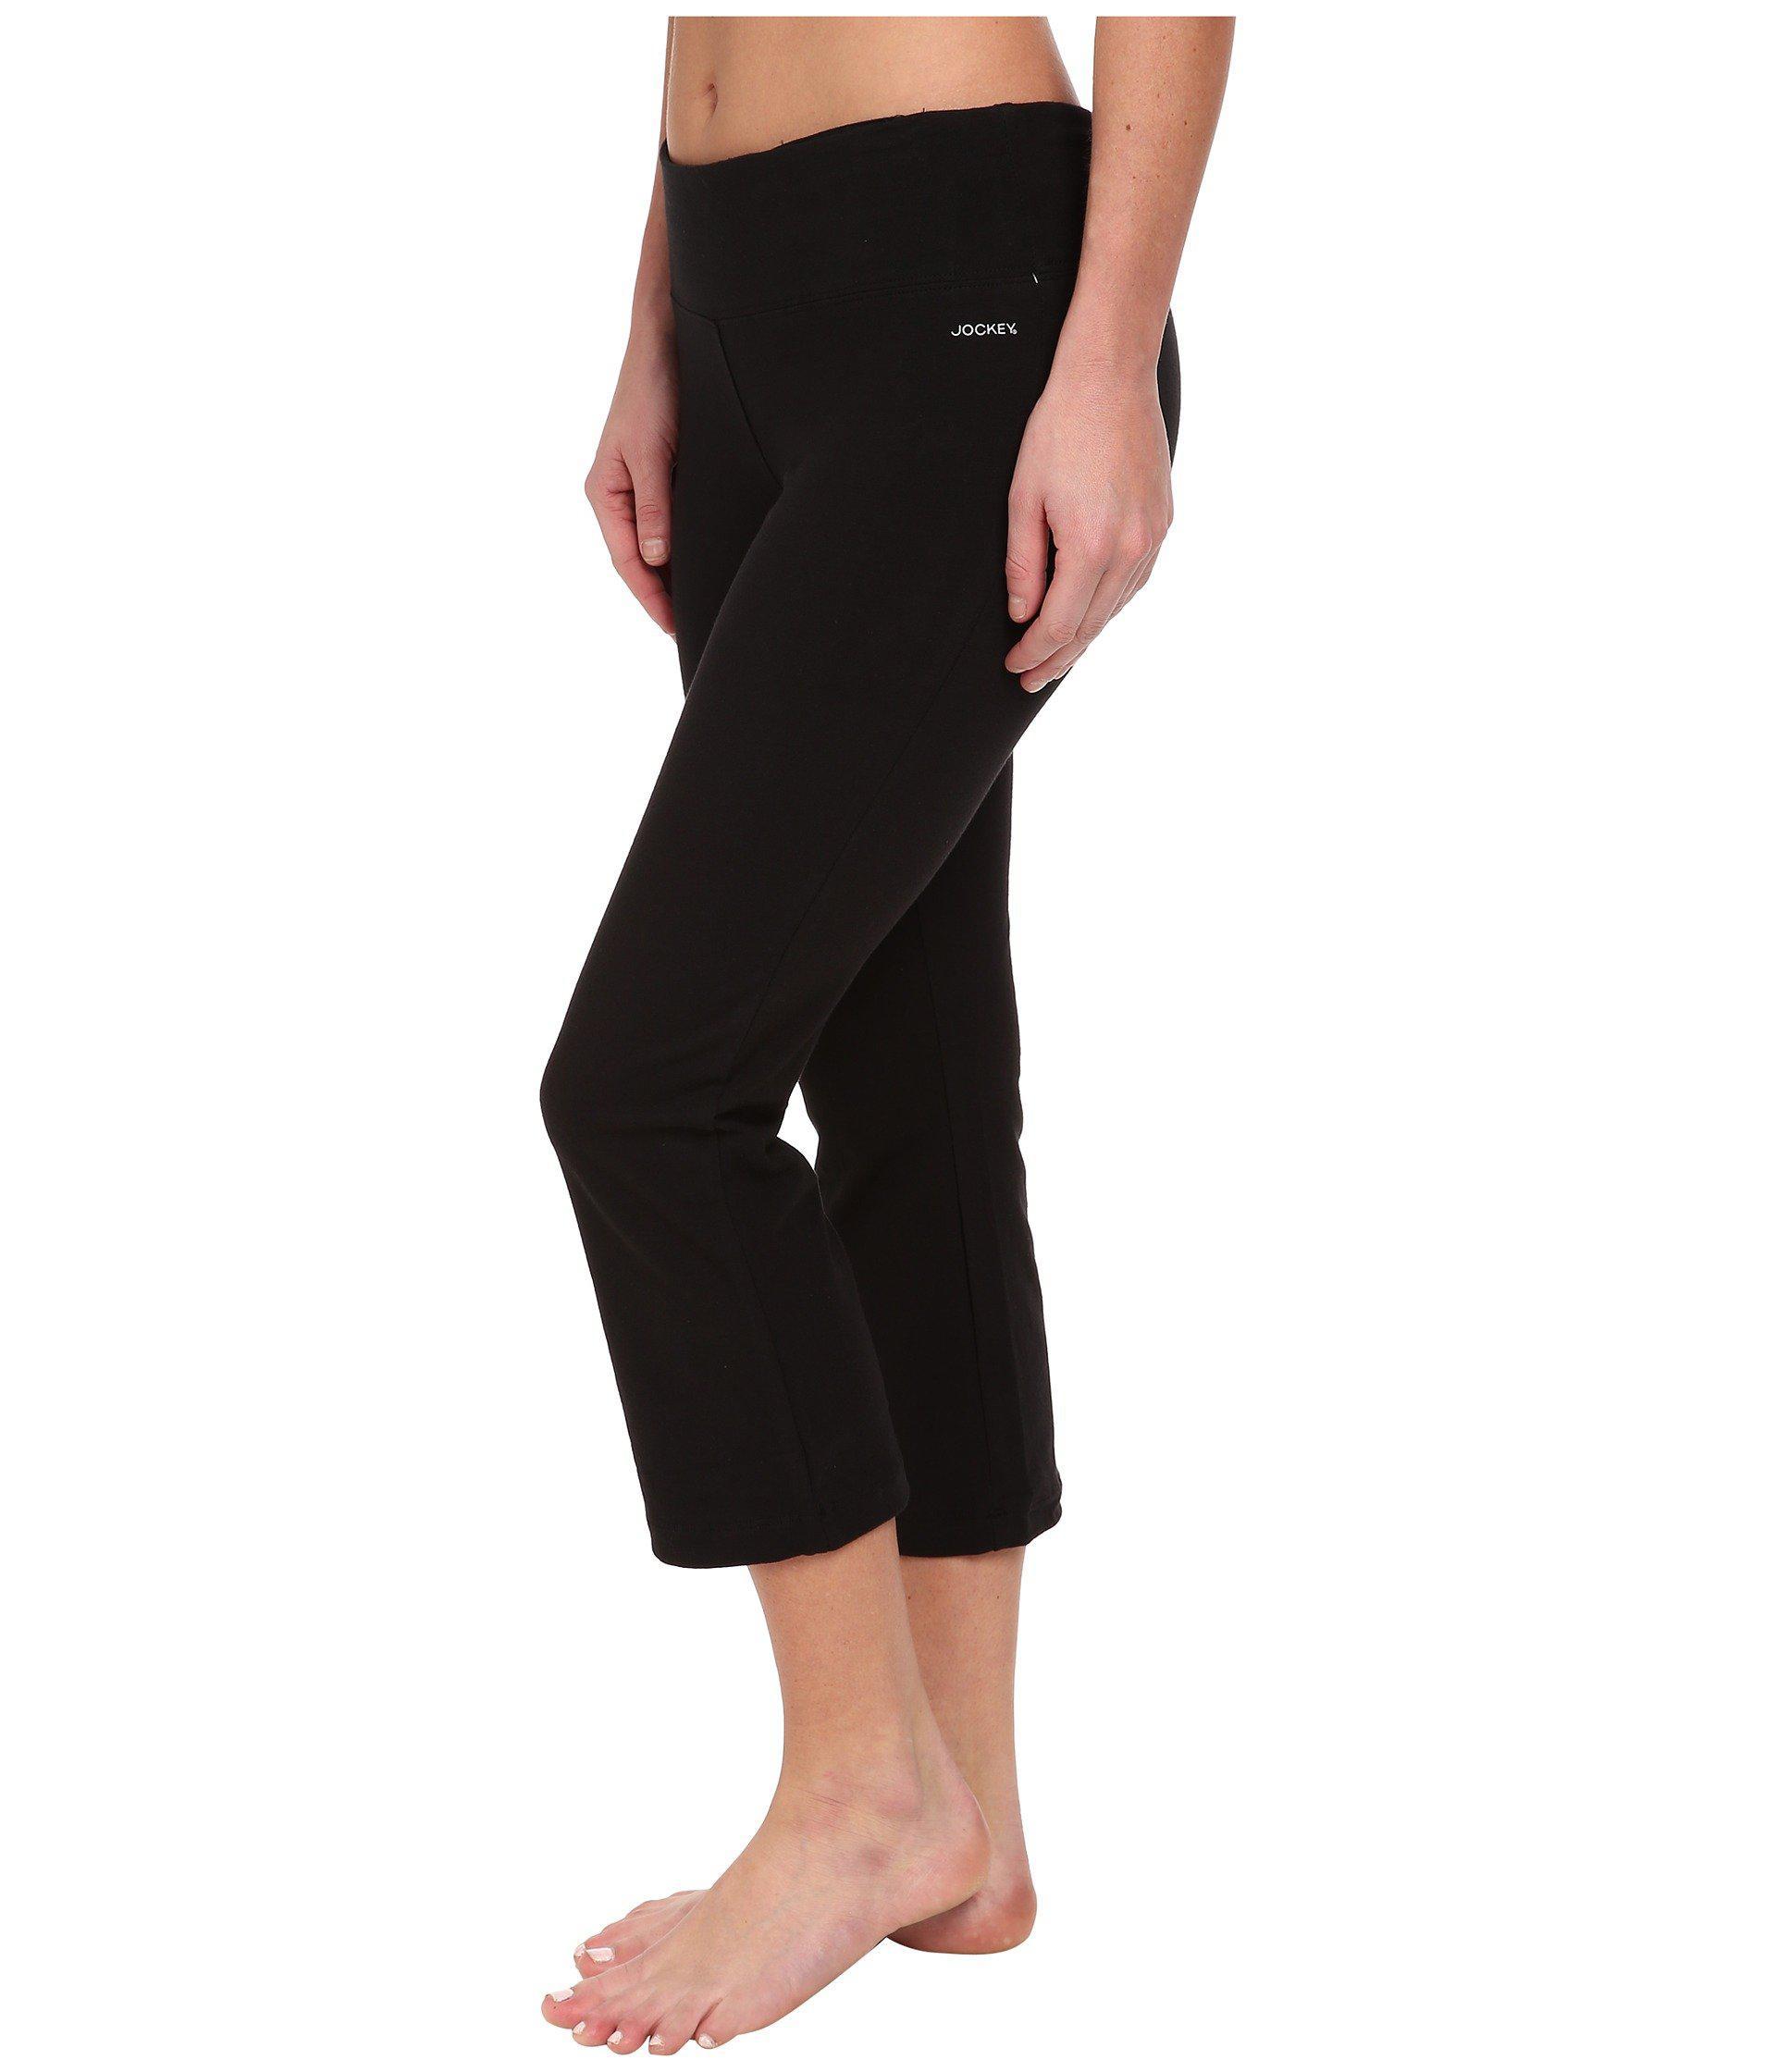 35c861f0e9a58 Lyst - Jockey Active Slim Capri Flare (black) Women's Capri in Black